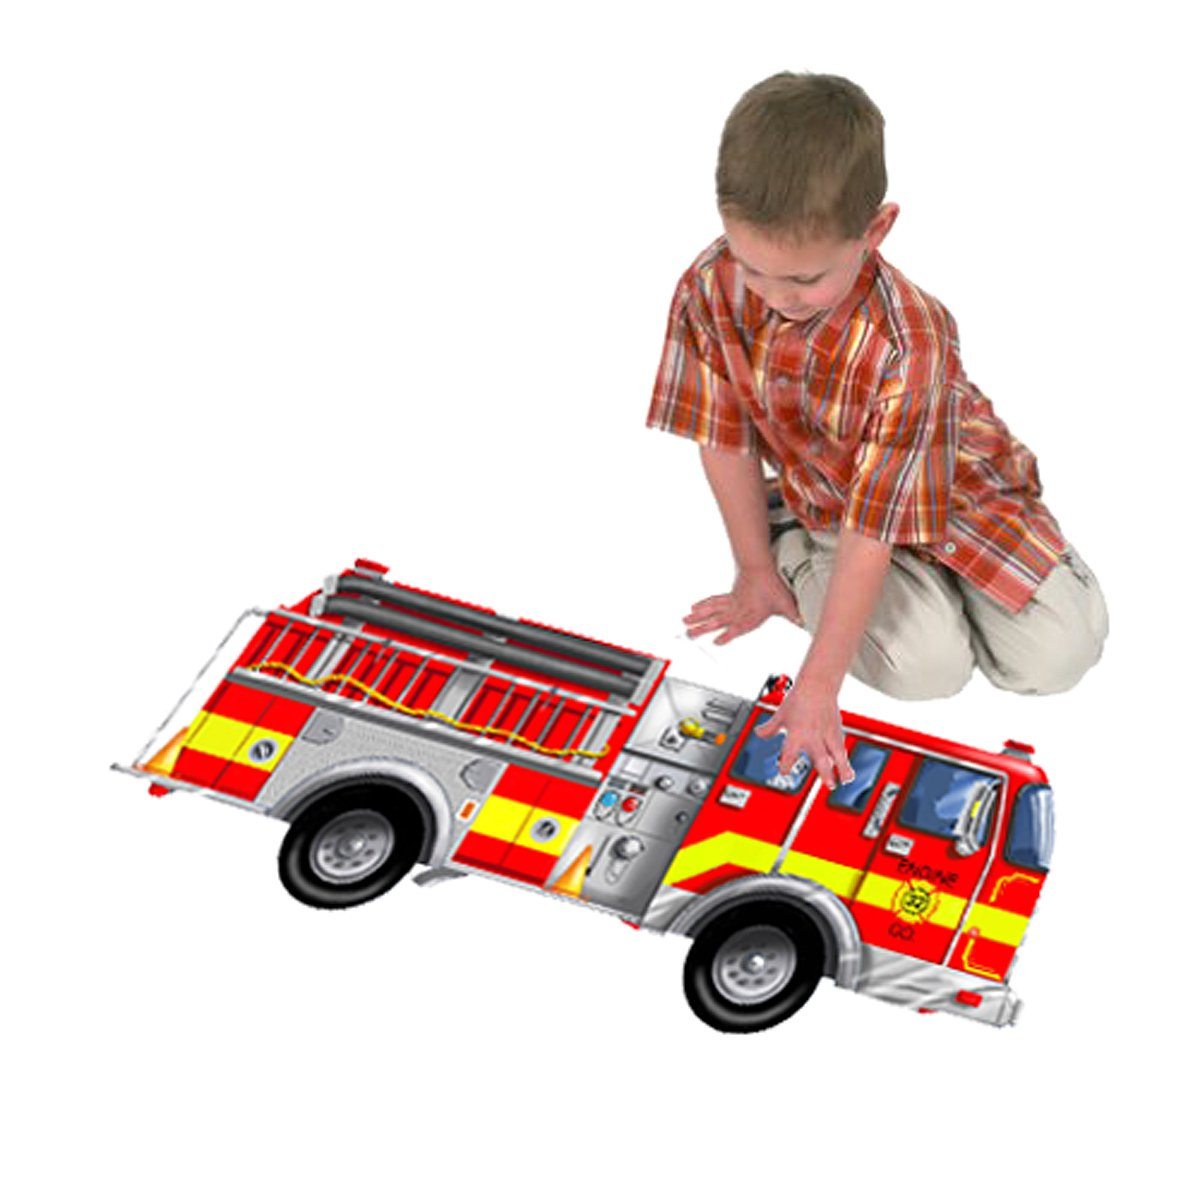 Exceptional Amazon.com: Melissa U0026 Doug Fire Truck Jumbo Jigsaw Floor Puzzle (24 Pcs, 4  Feet Long): Melissa U0026 Doug, 24pc 436 : Toys U0026 Games